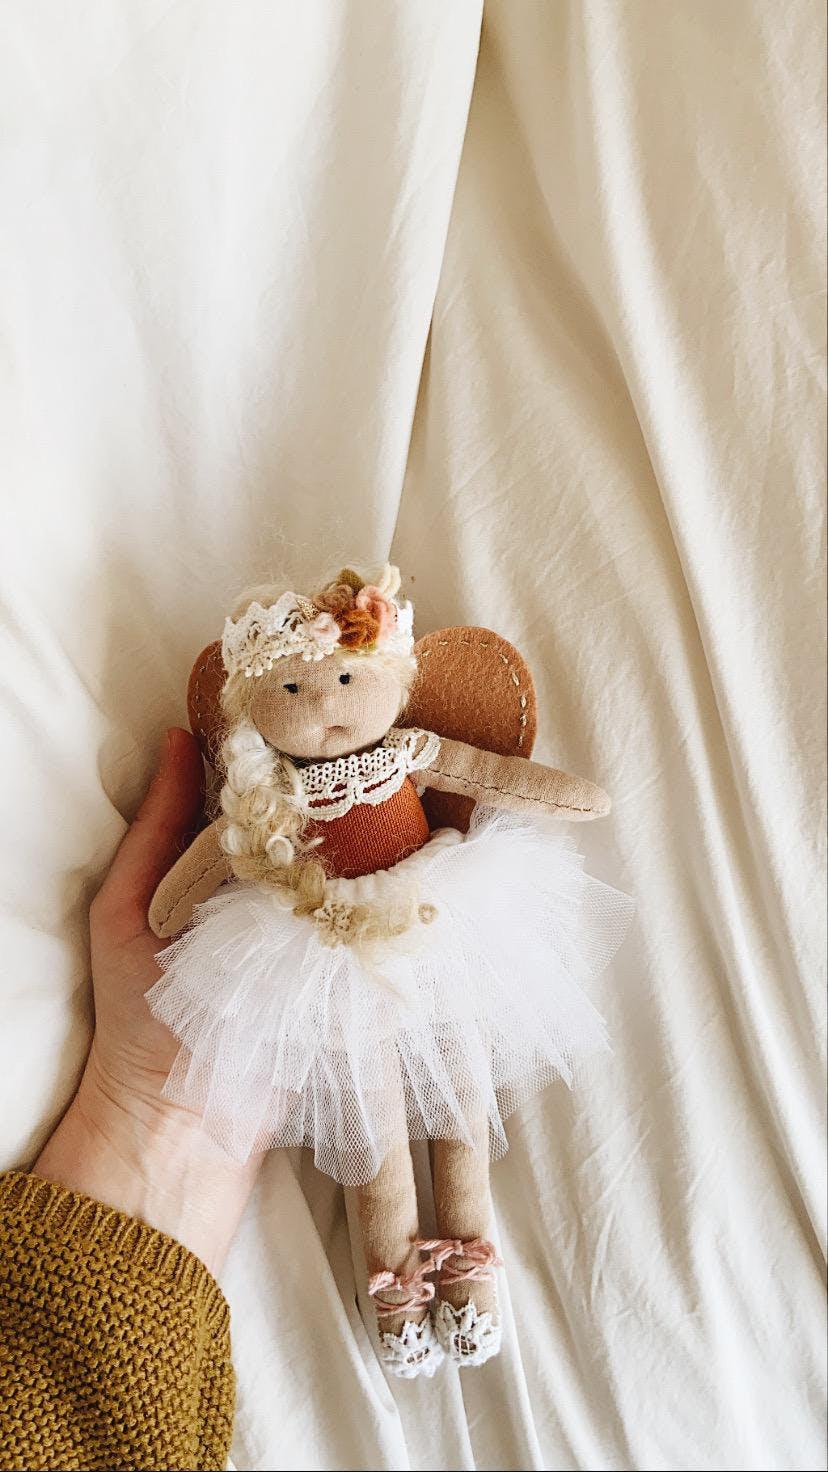 doll hand